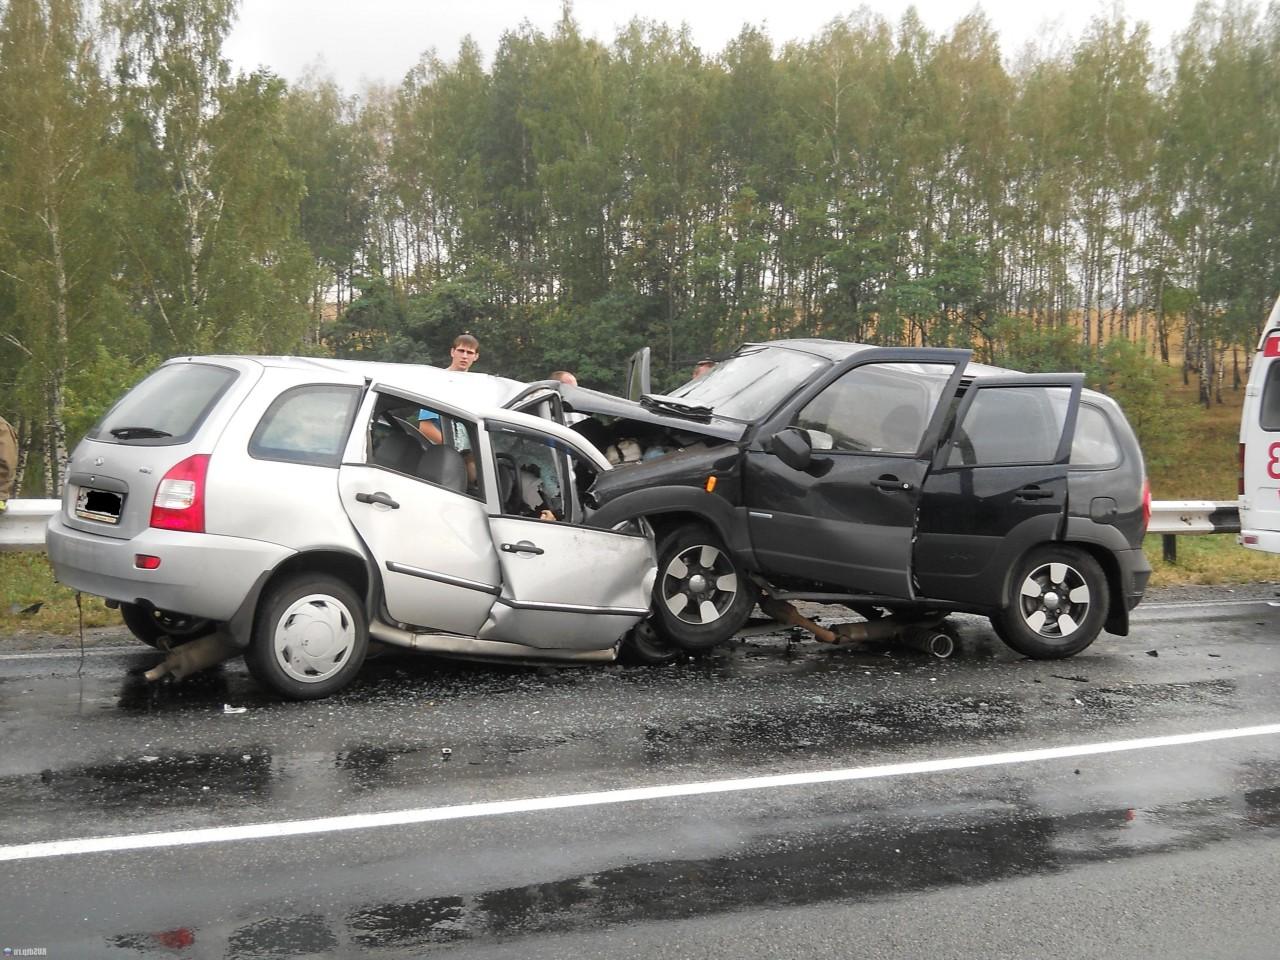 Фото с последней аварии в борисоглебске 2 фотография